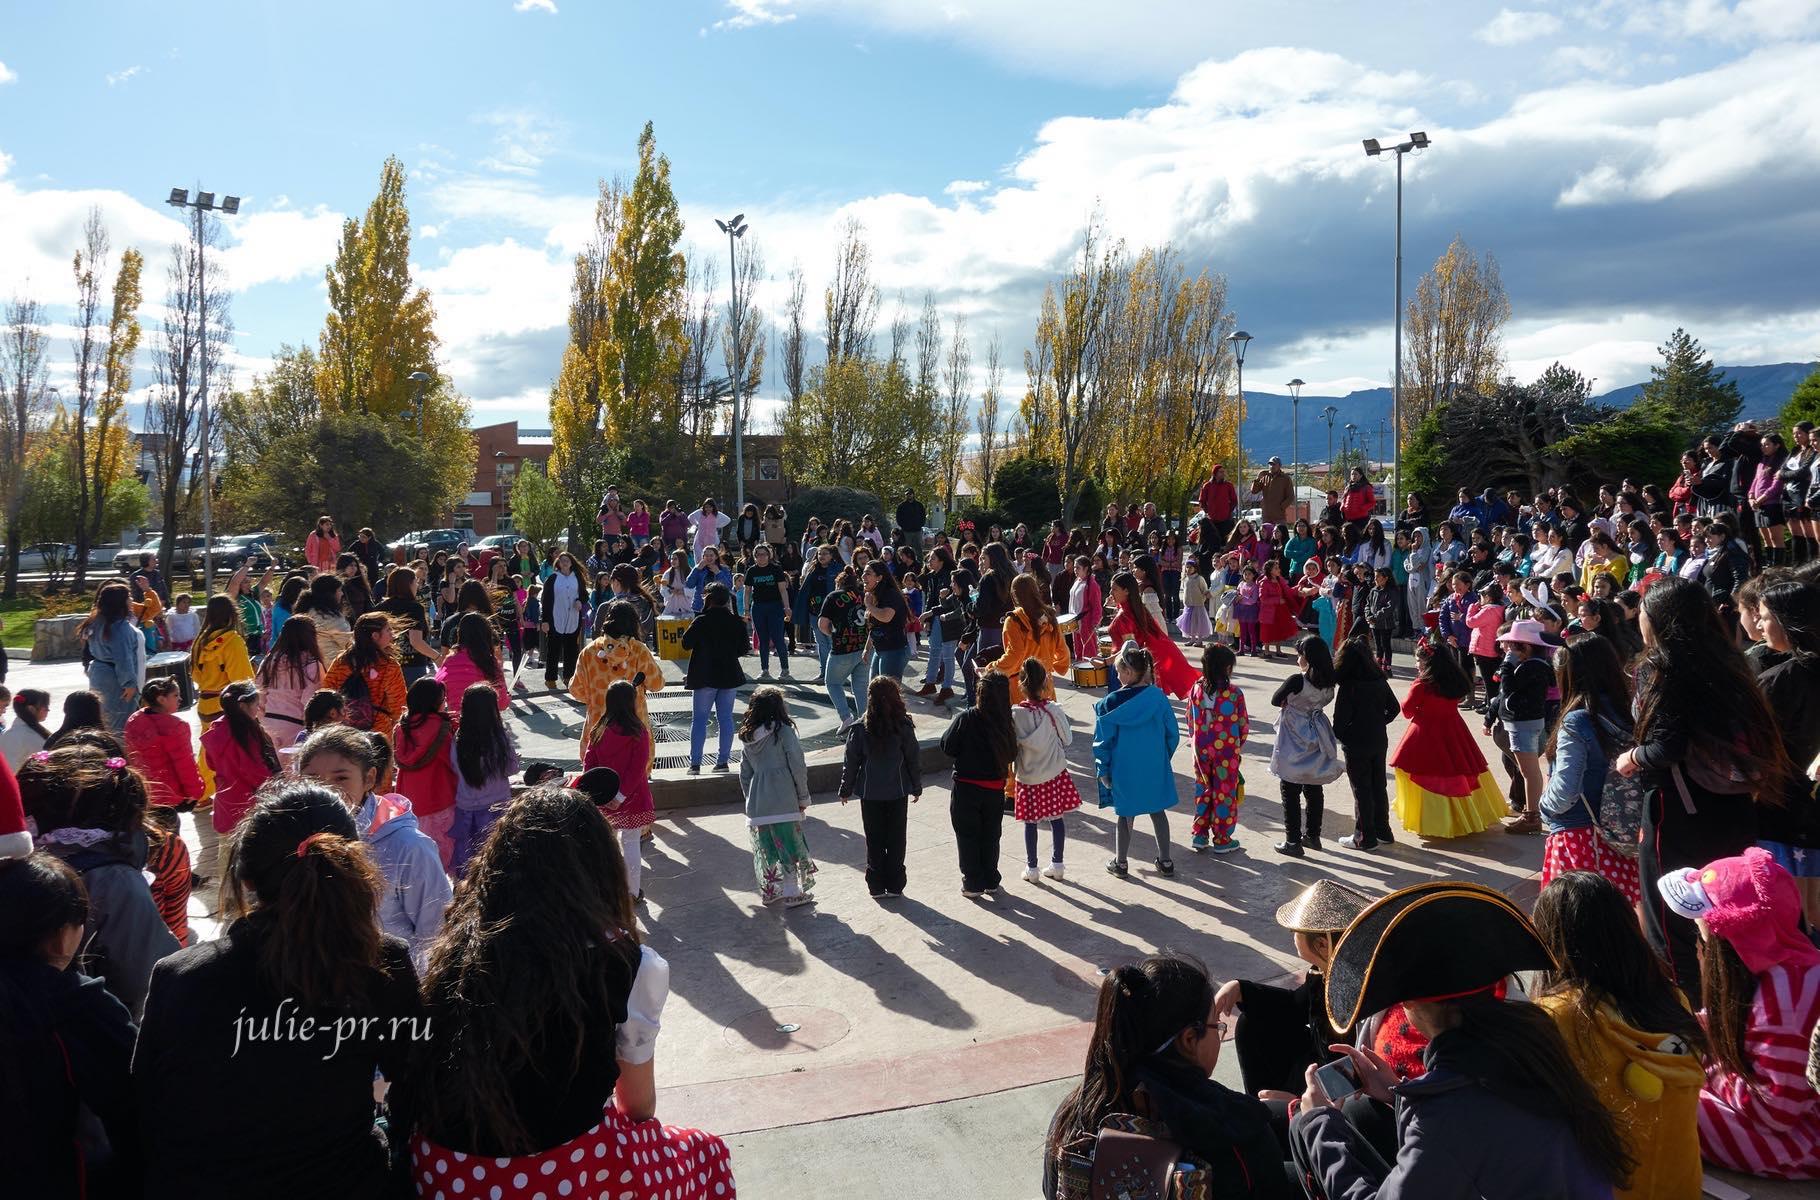 Чили, Патагония, Пуэрто-Наталес, праздник